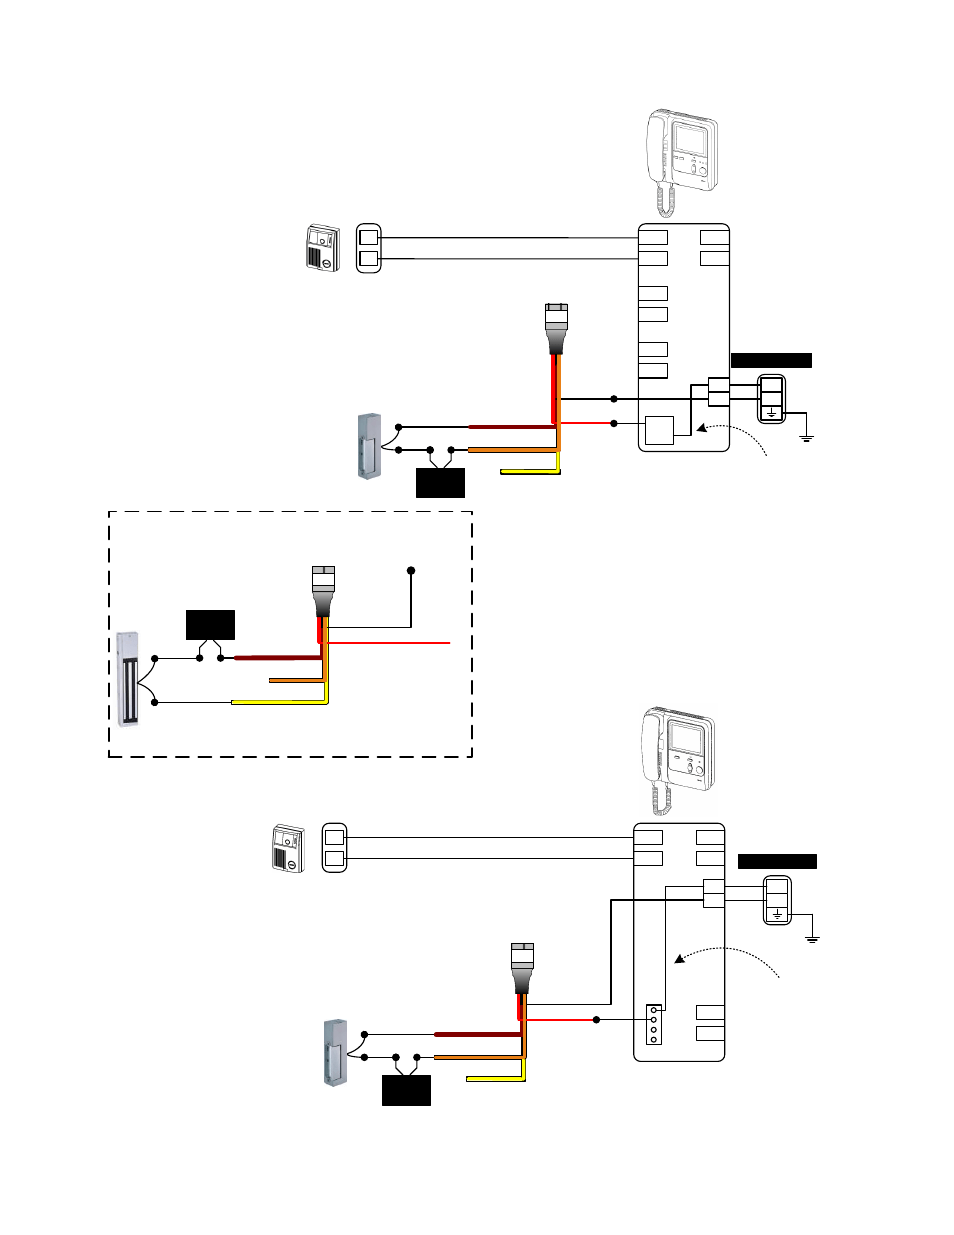 aiphone intercom wiring diagram bulldog remote starter speaker diagrams great installation of library rh 41 dirtytalk camgirls de